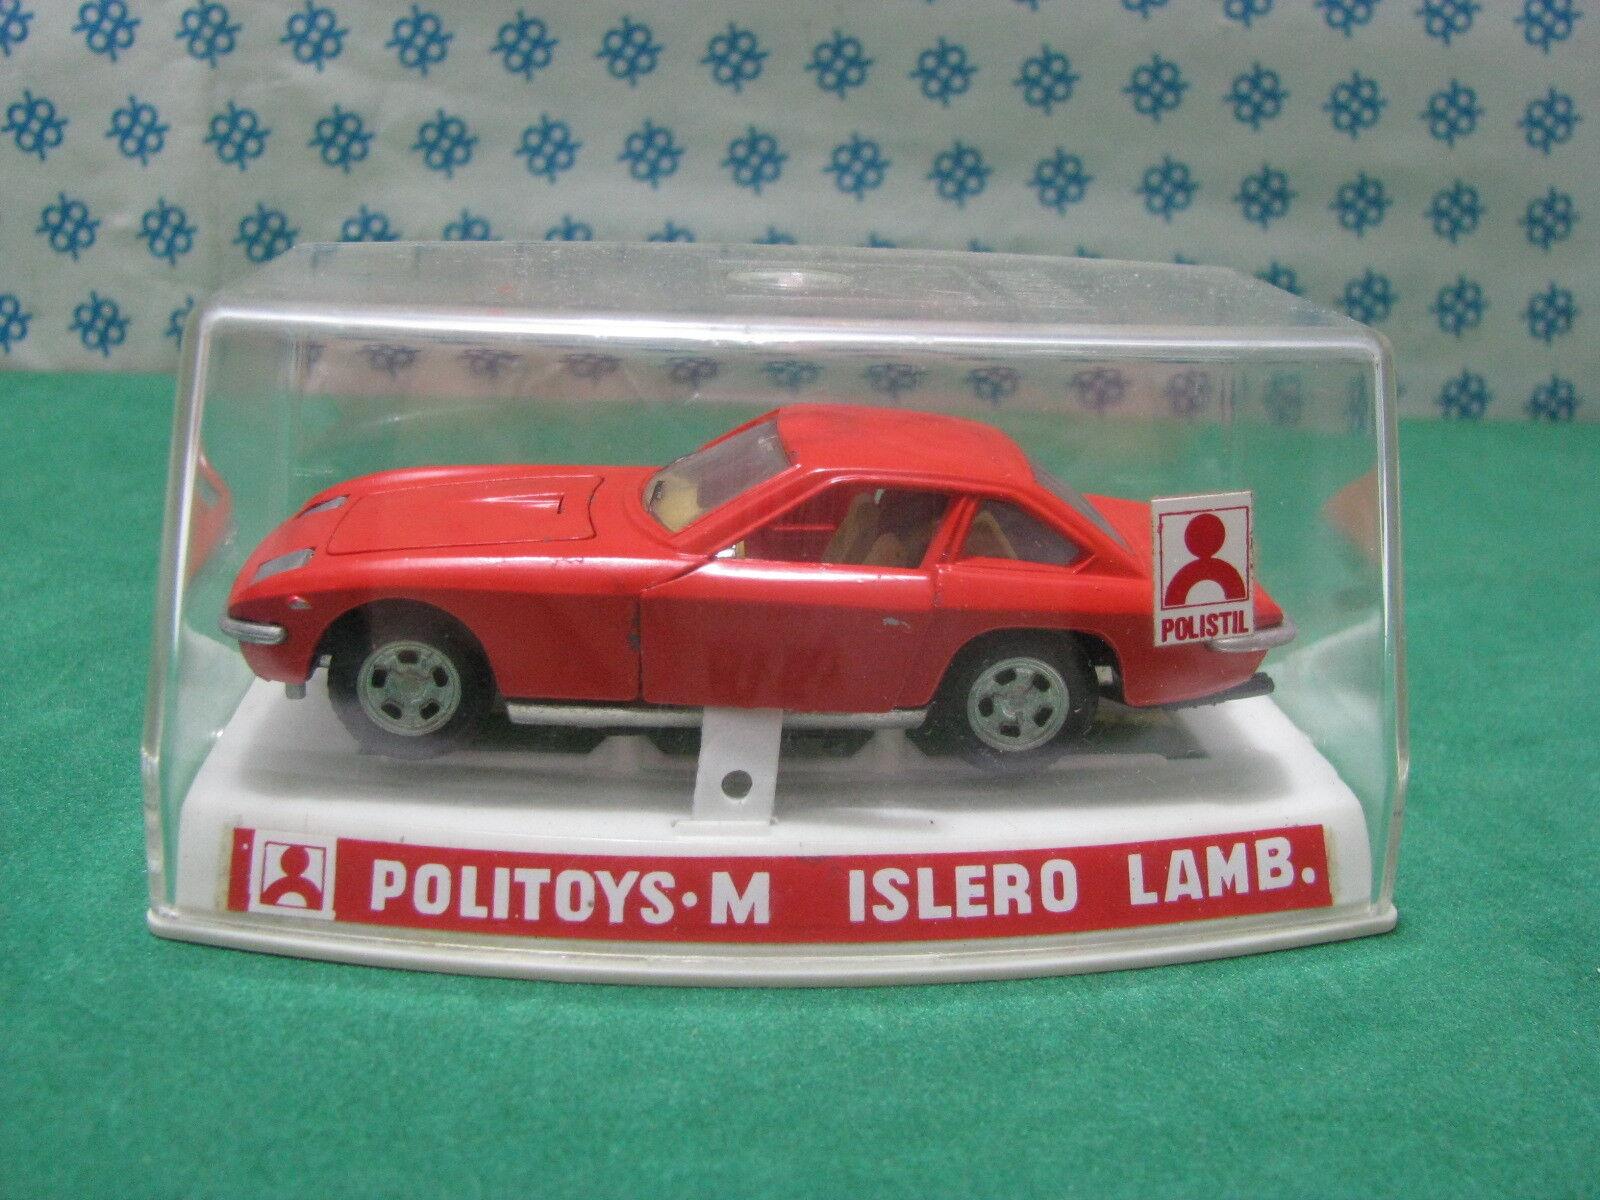 Vintage - Lamborghini Islero - 1 43 Politoys -m558 Nmib